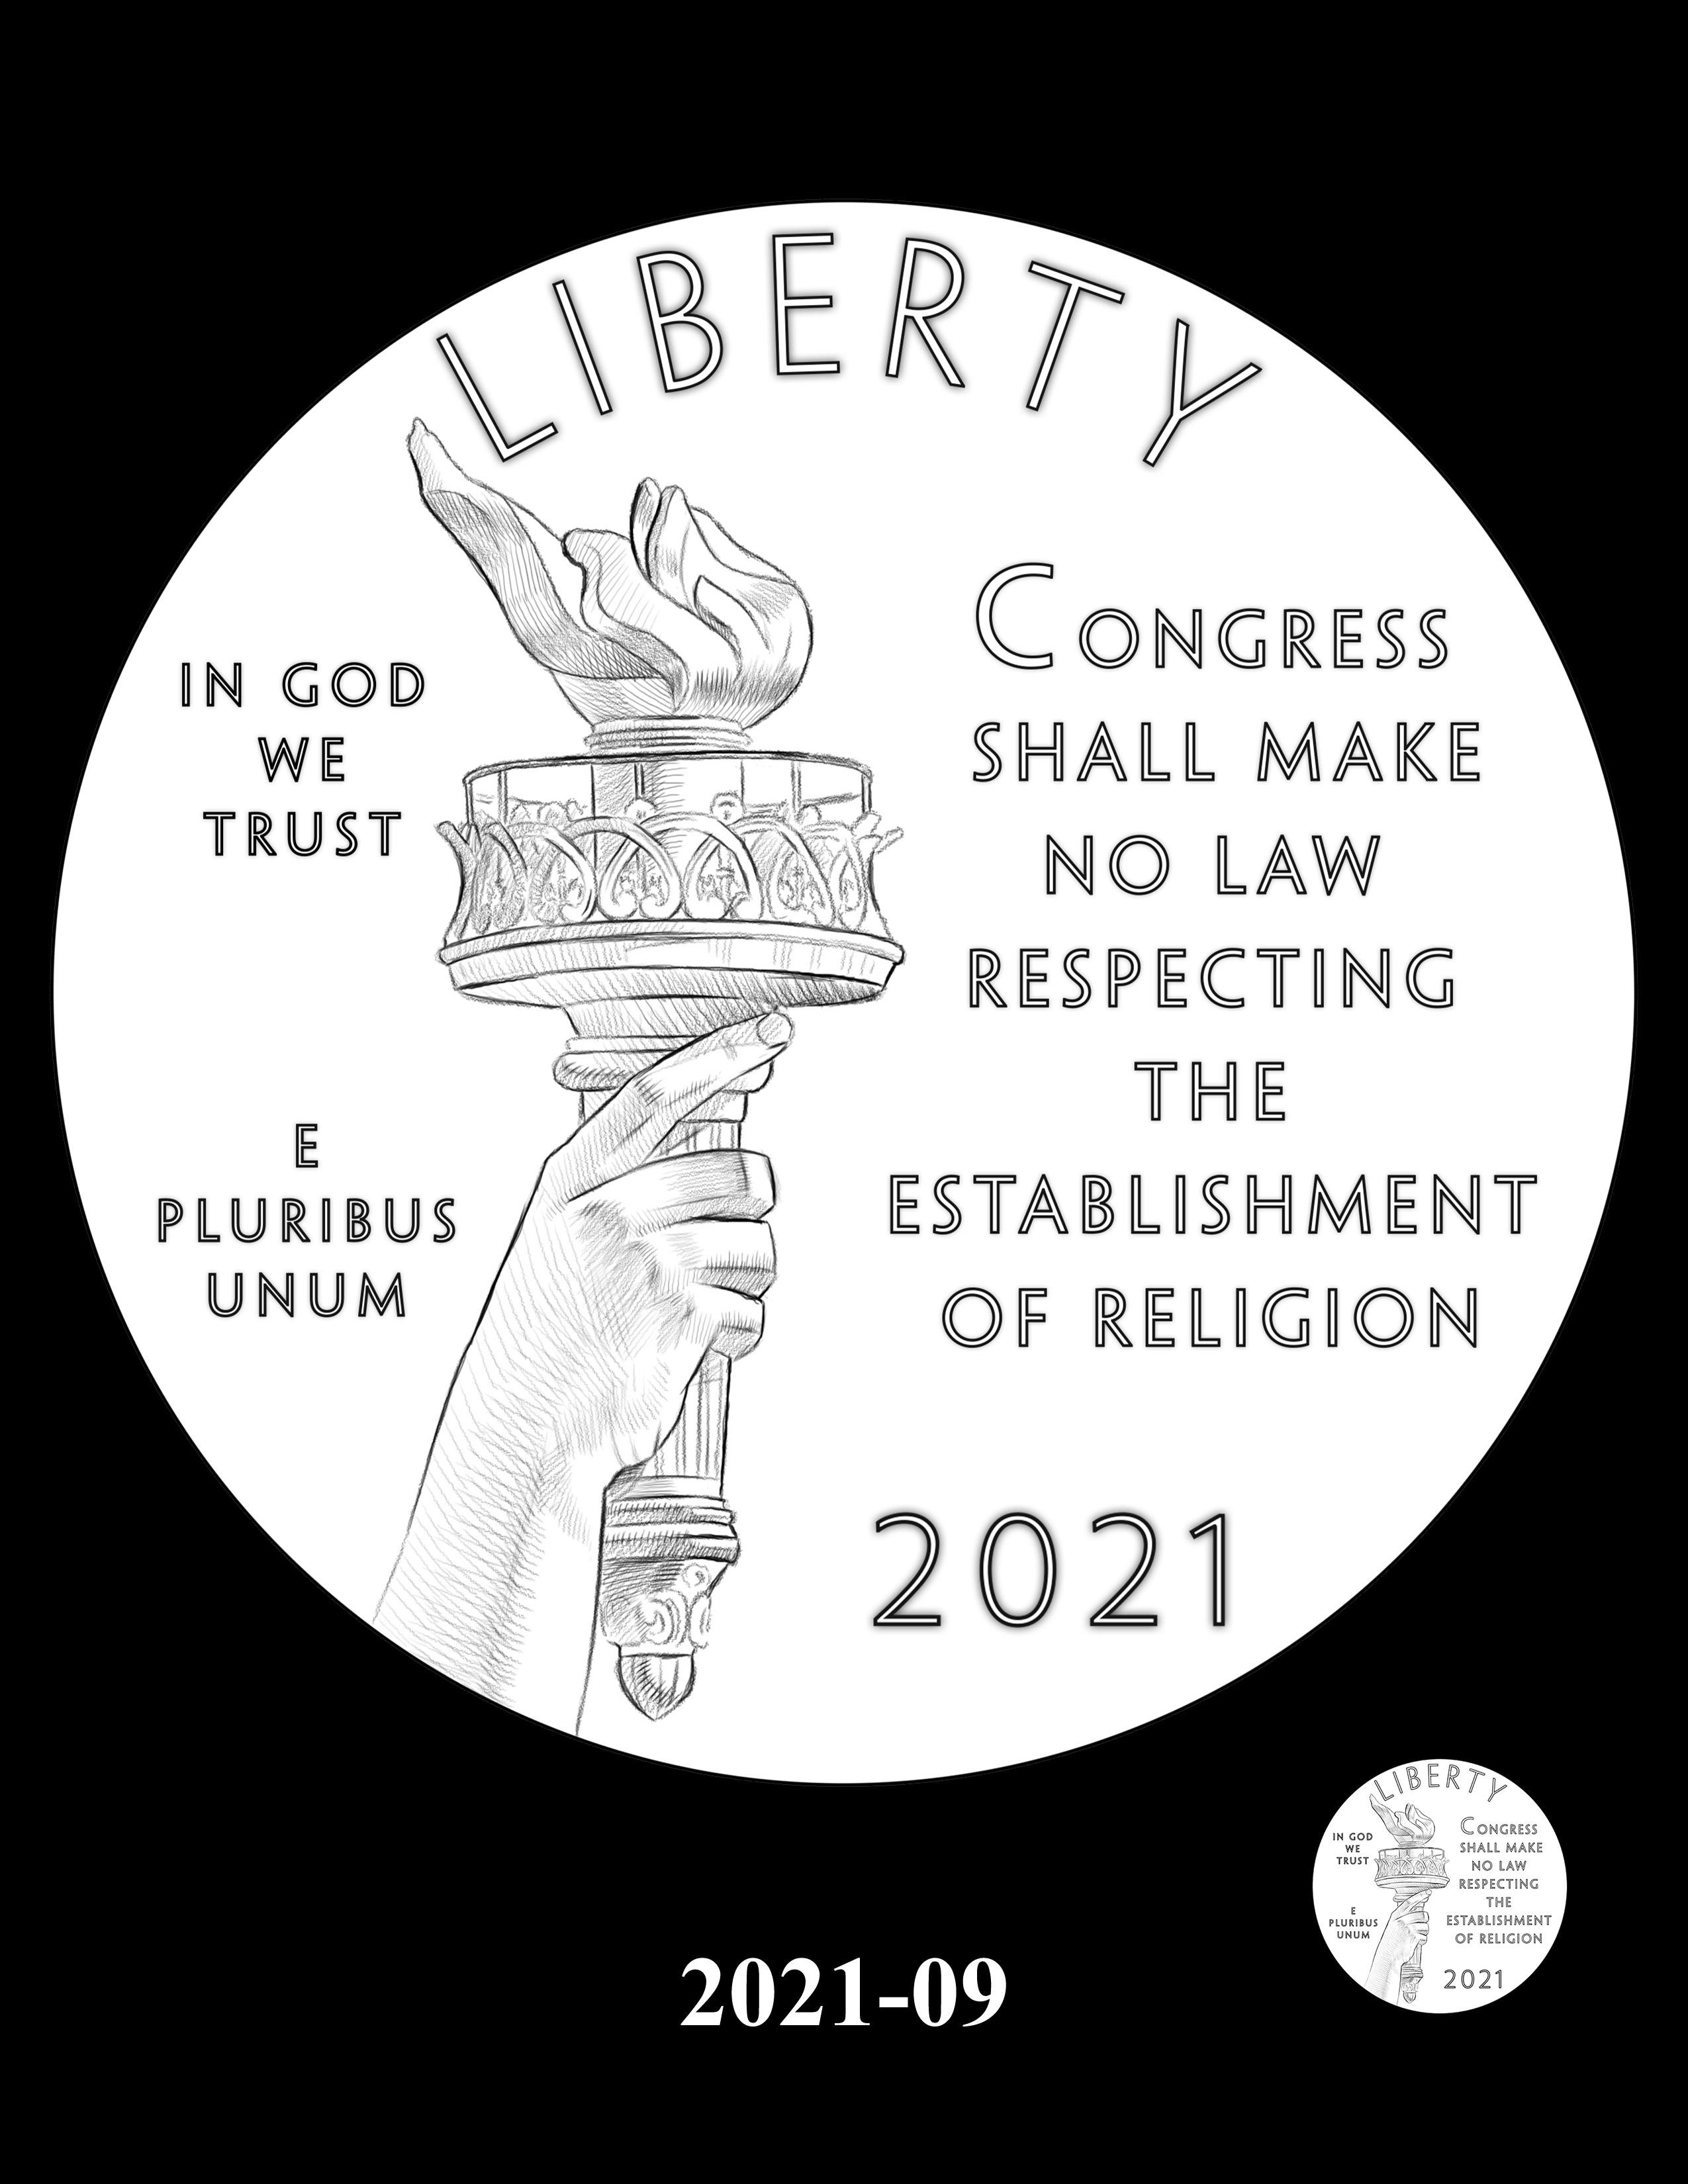 09-2021 -- 2021 - 2025 American Eagle Platinum Proof Program